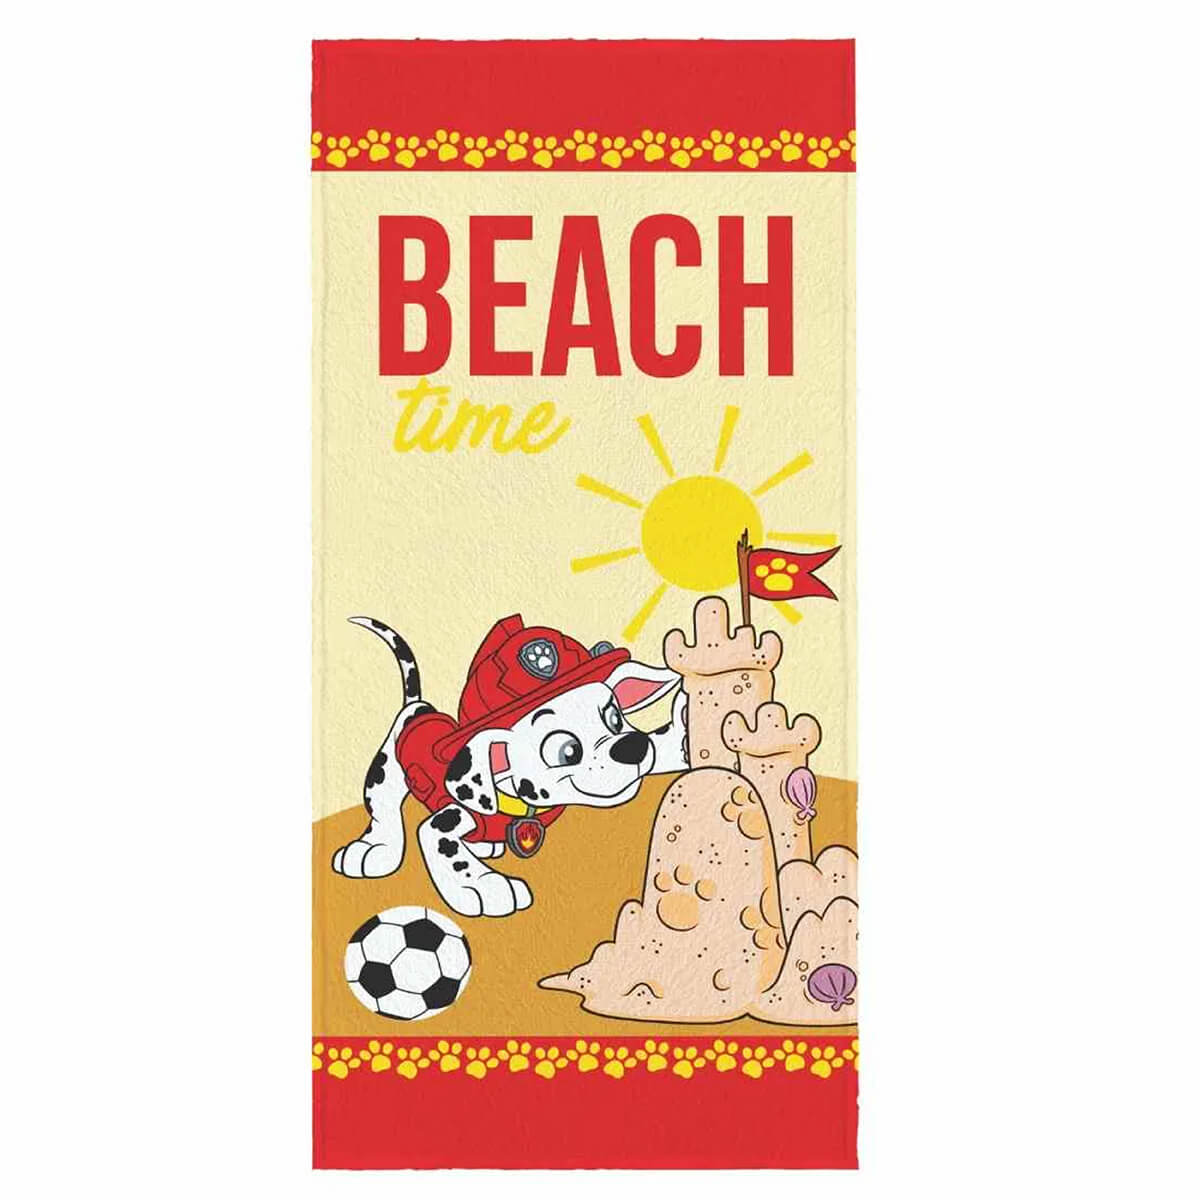 Toalha de Banho Infantil Felpuda Patrulha Canina Beach Time